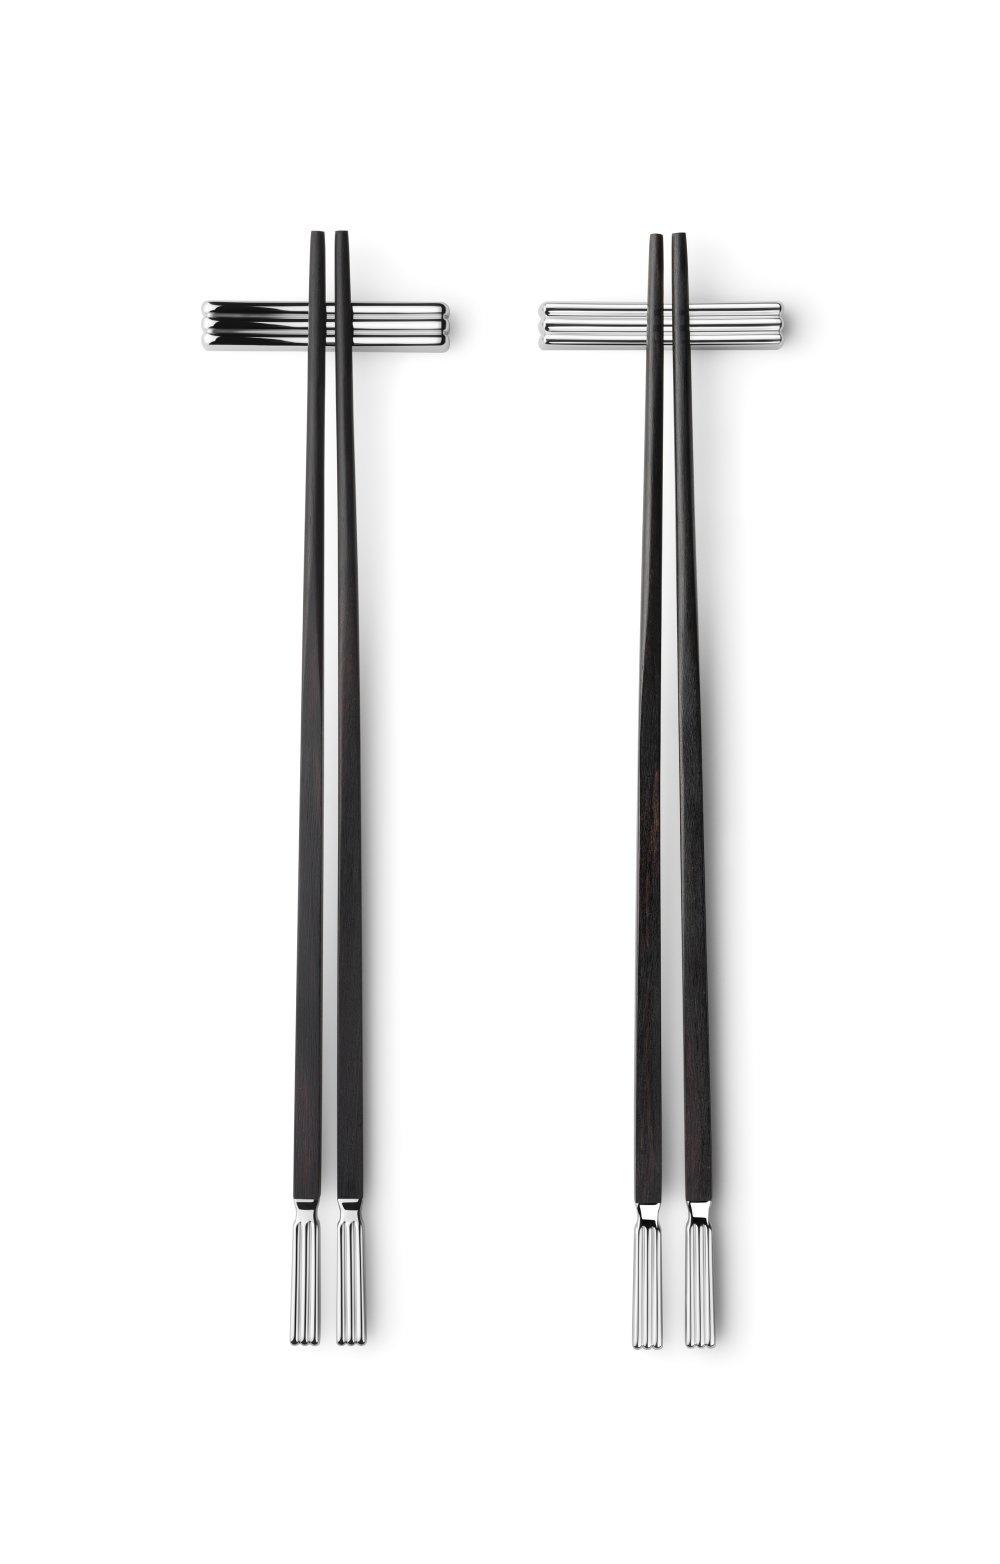 Georg Jensen Bernadotte Chopsticks Set van 2 Stuks